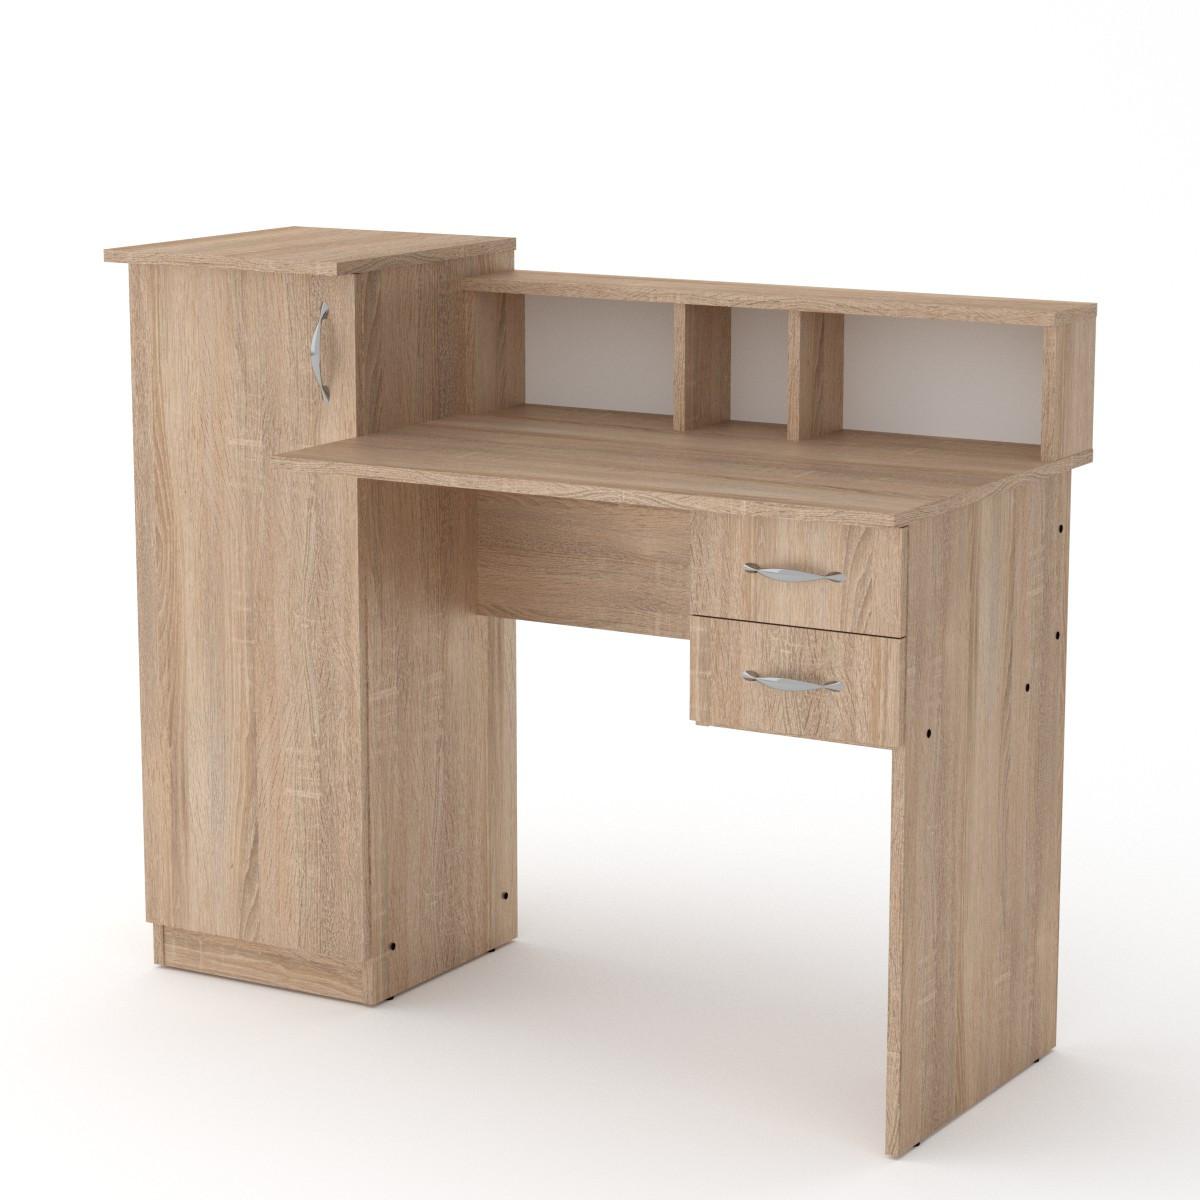 Стол письменный пи пи-1 дуб сонома Компанит (118х55х96 см)